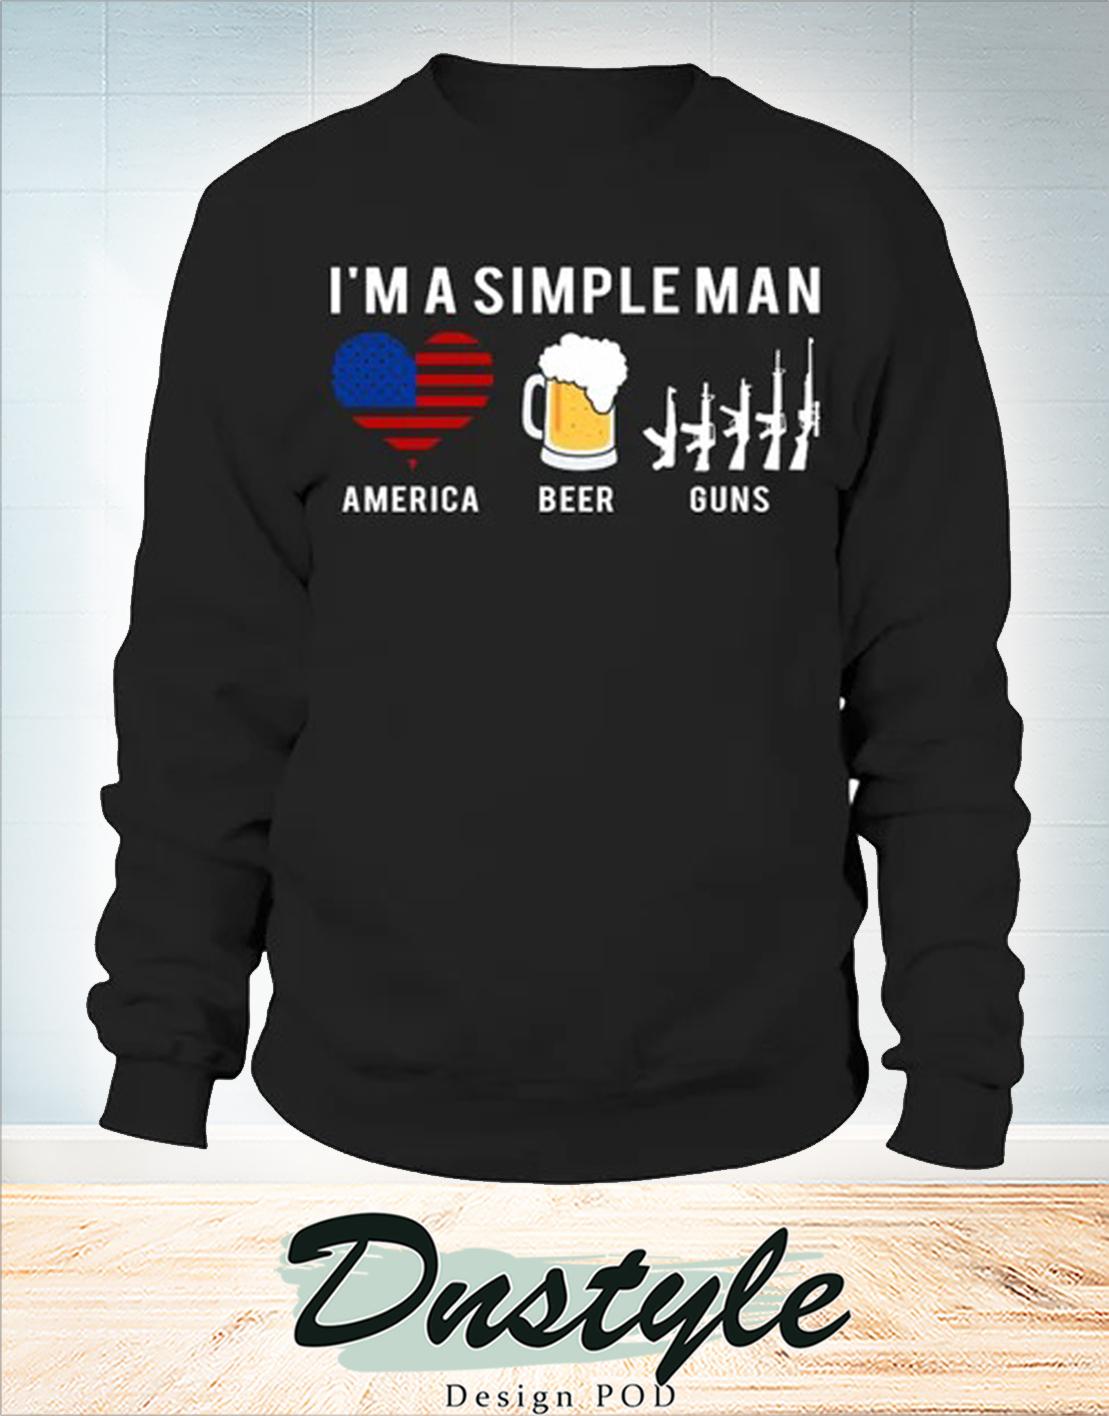 I'm a simple man america beer guns long sleeve